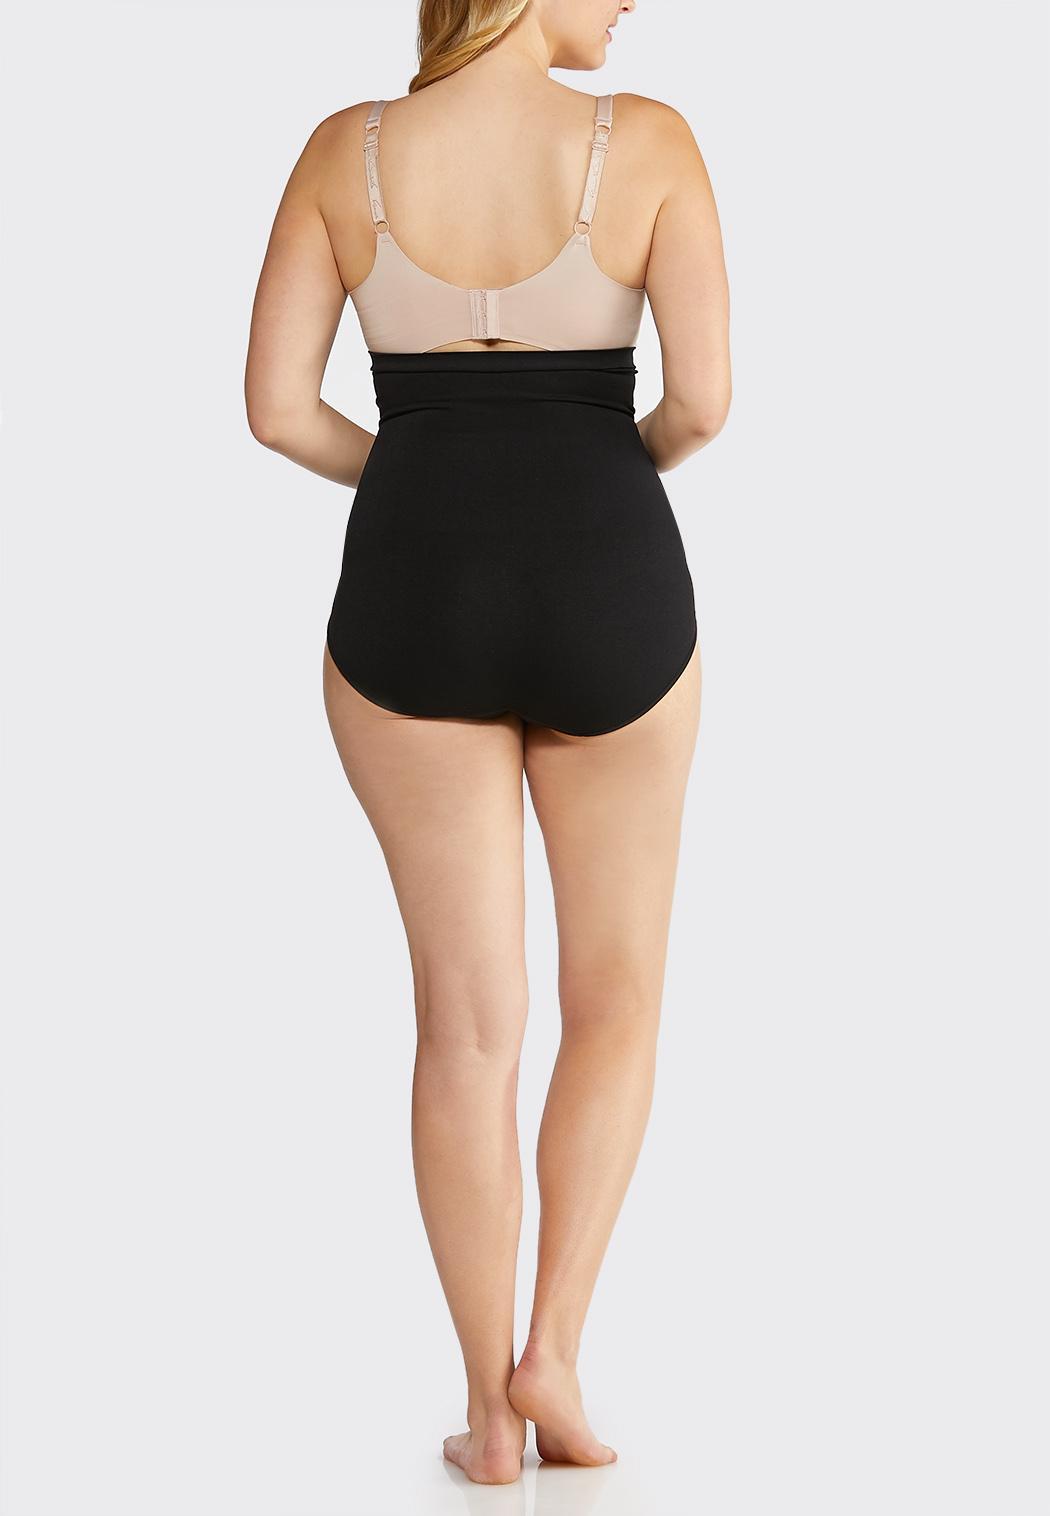 Plus Extended Black High Waist Seamless Panties (Item #35051515)